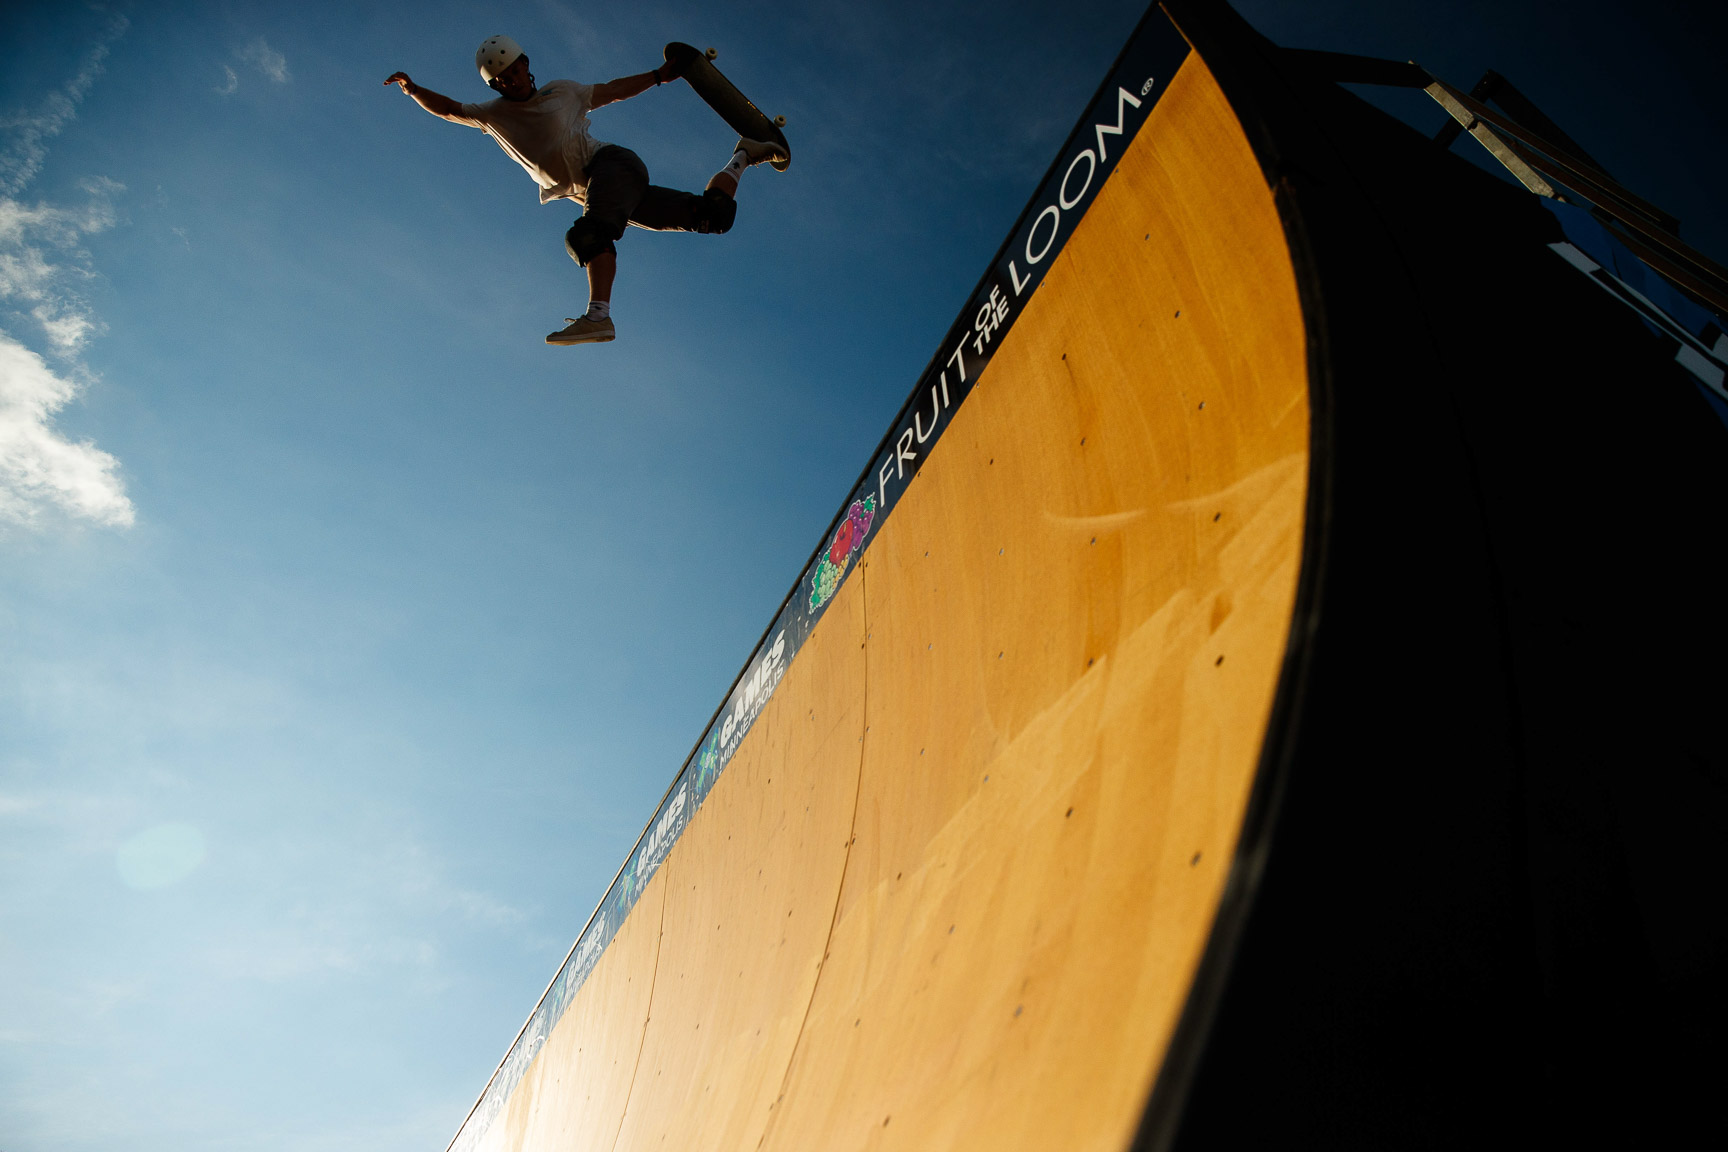 Skate Vert Practice